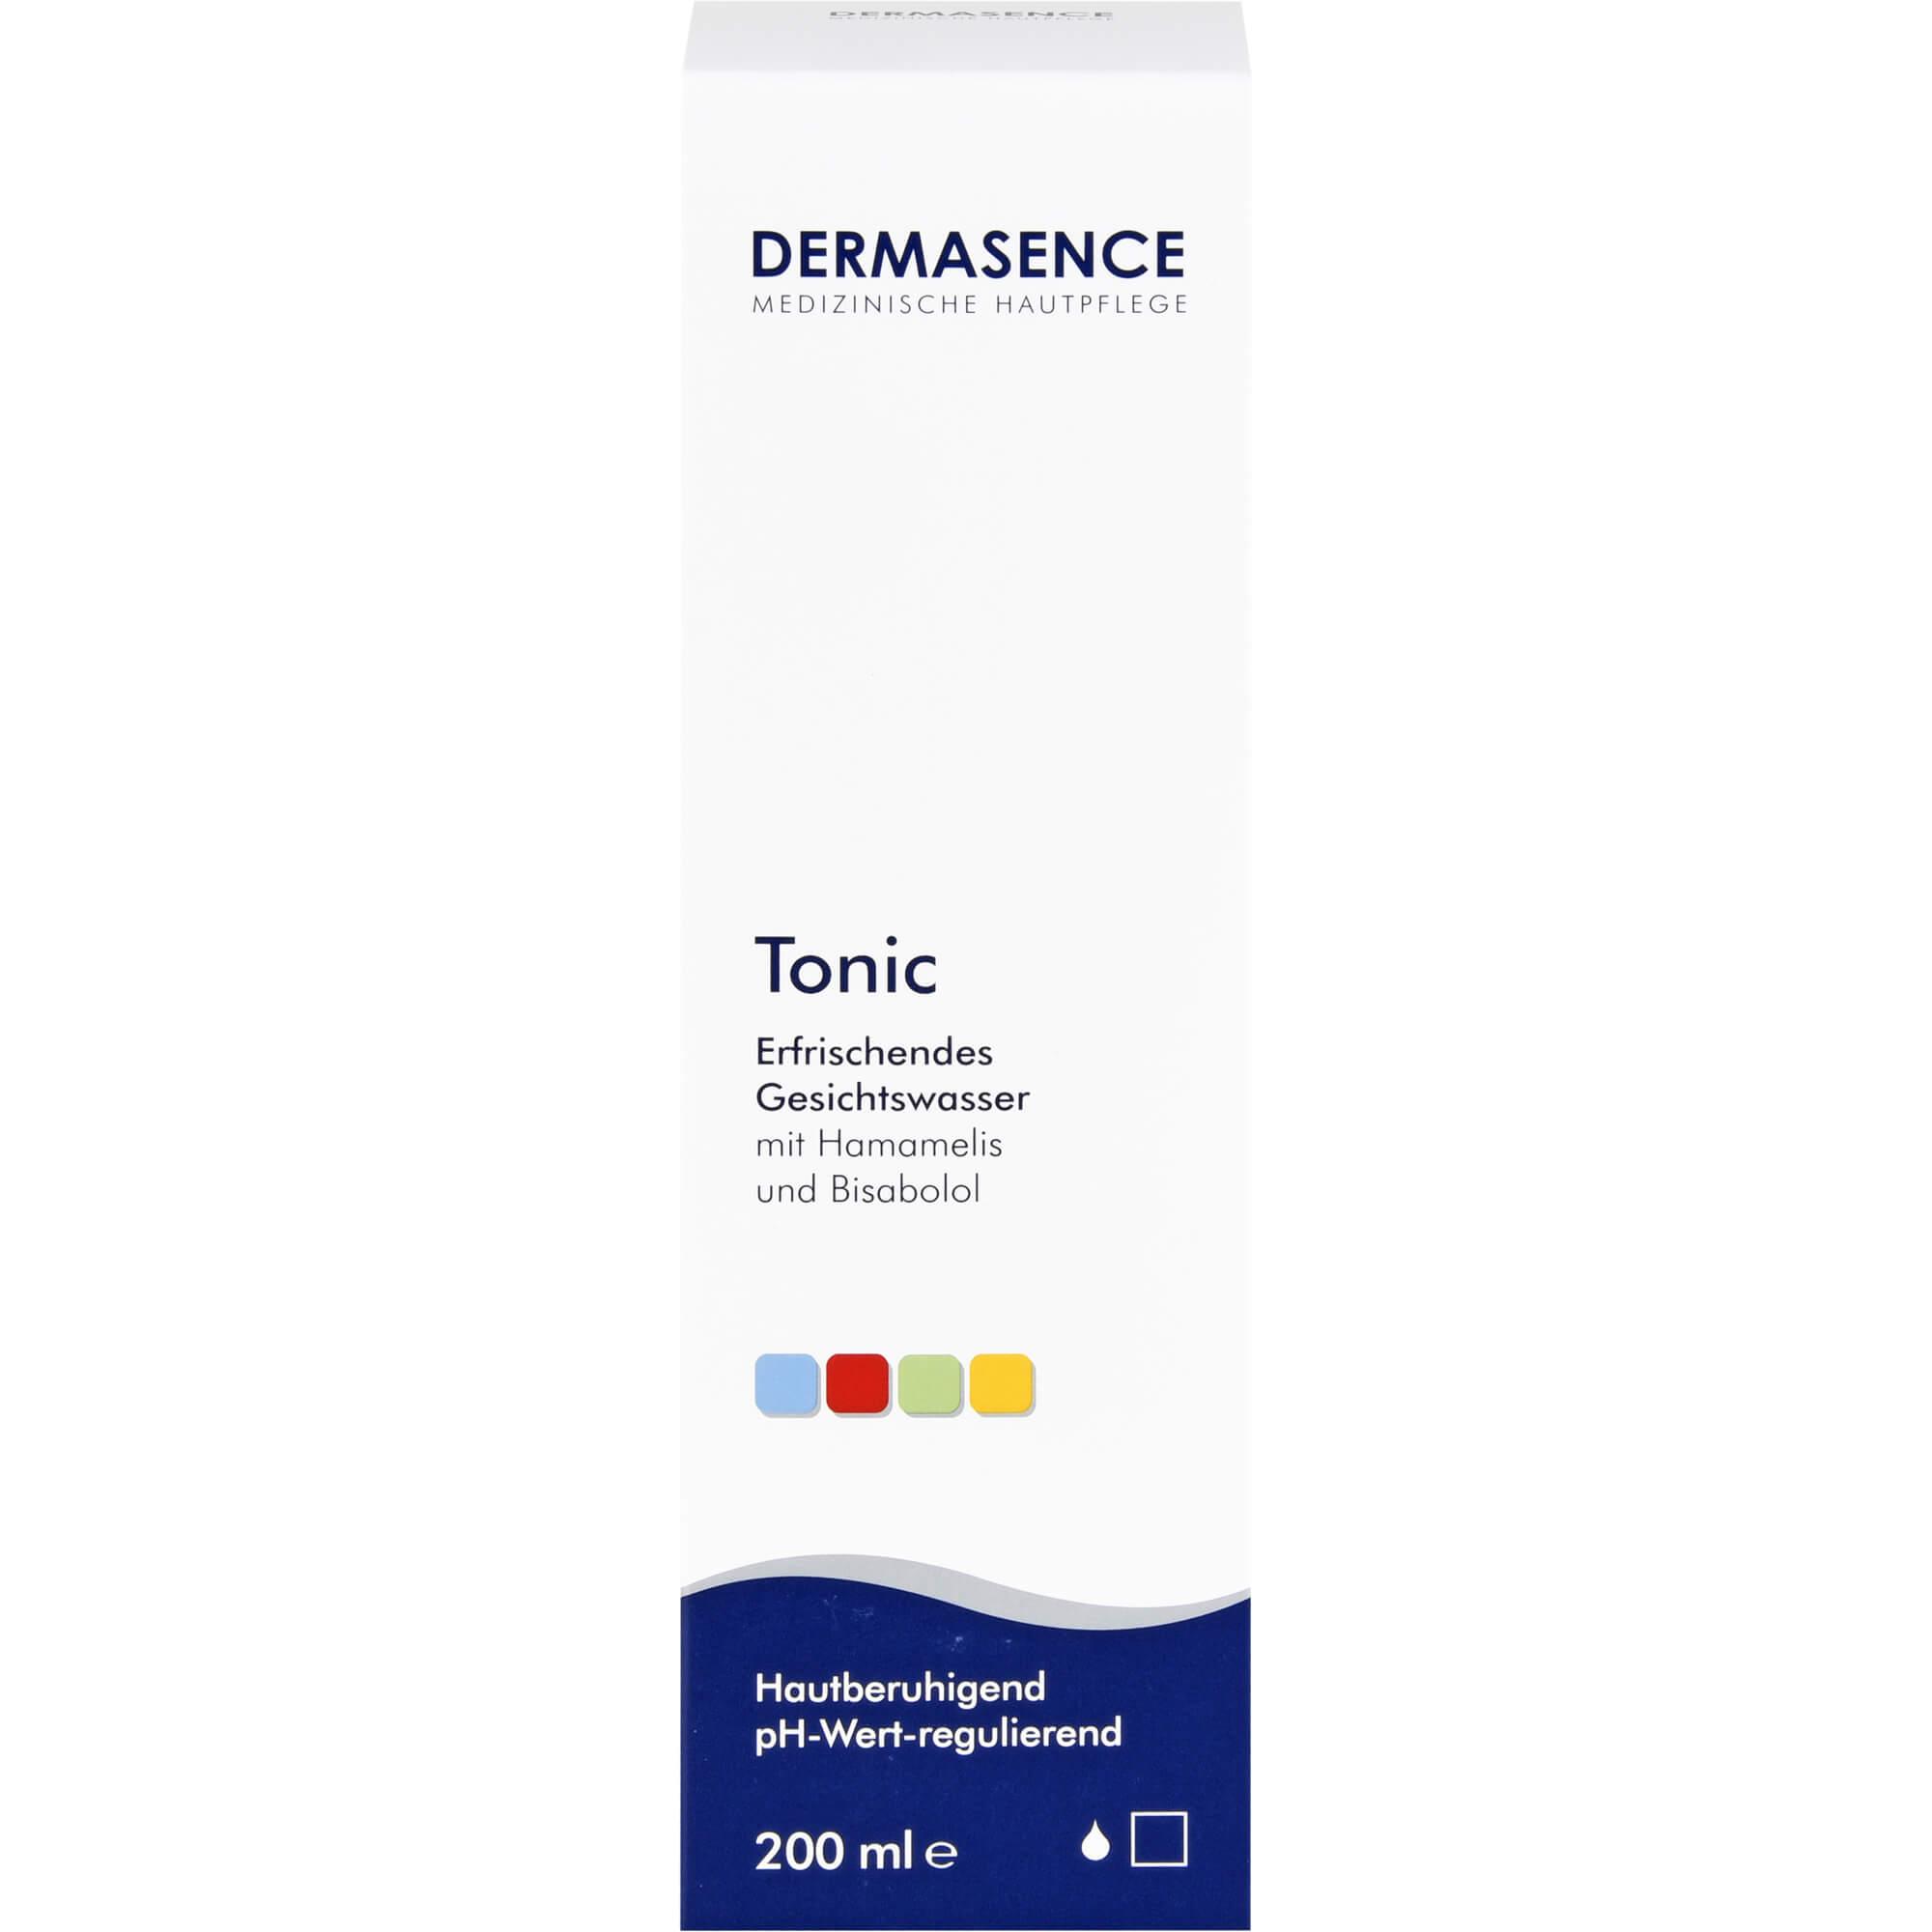 DERMASENCE Tonic